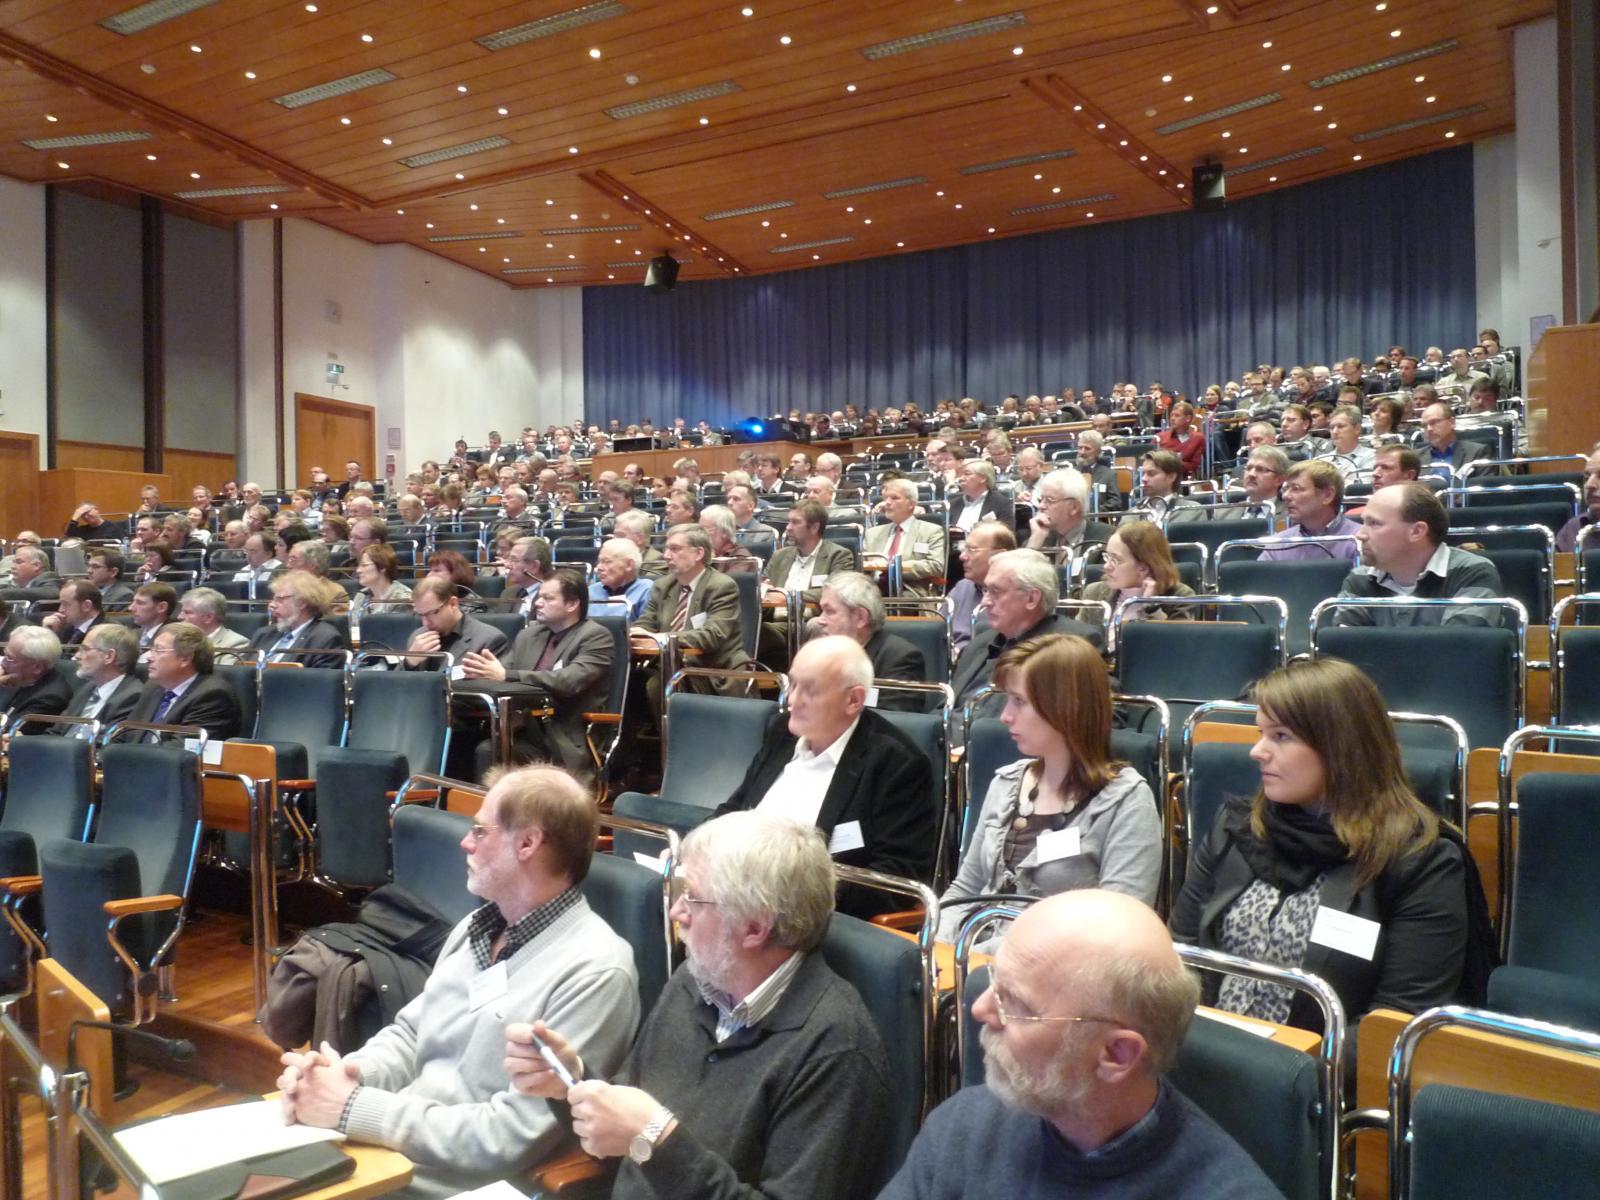 Vermessungswesen aktuell 2011 - Zuhörer